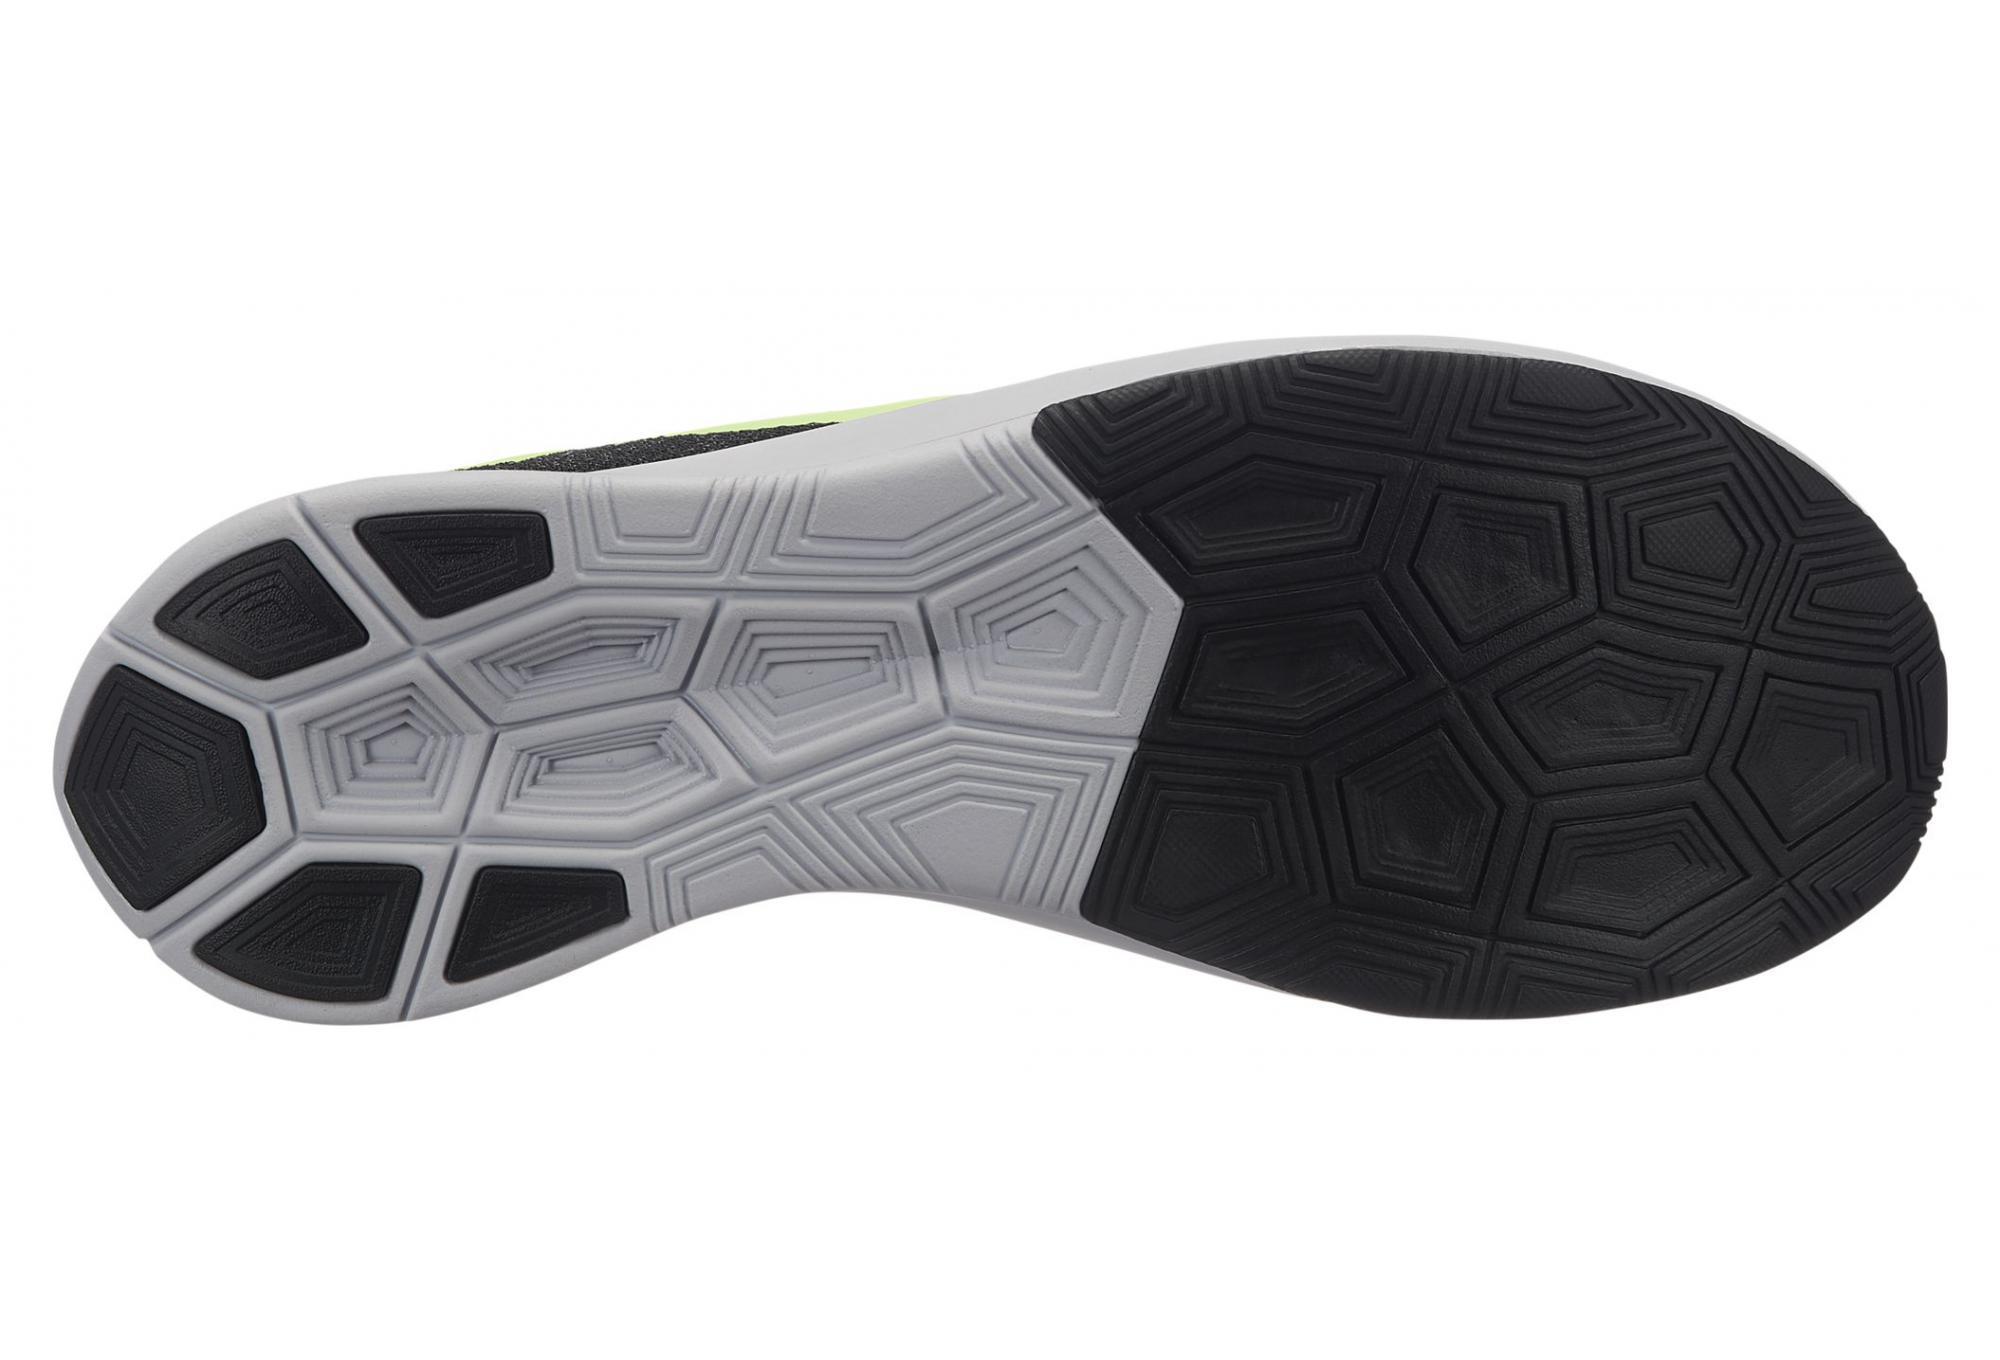 pas cher pour réduction 7118f 424d2 Nike Zoom Fly Flyknit Black Green Men